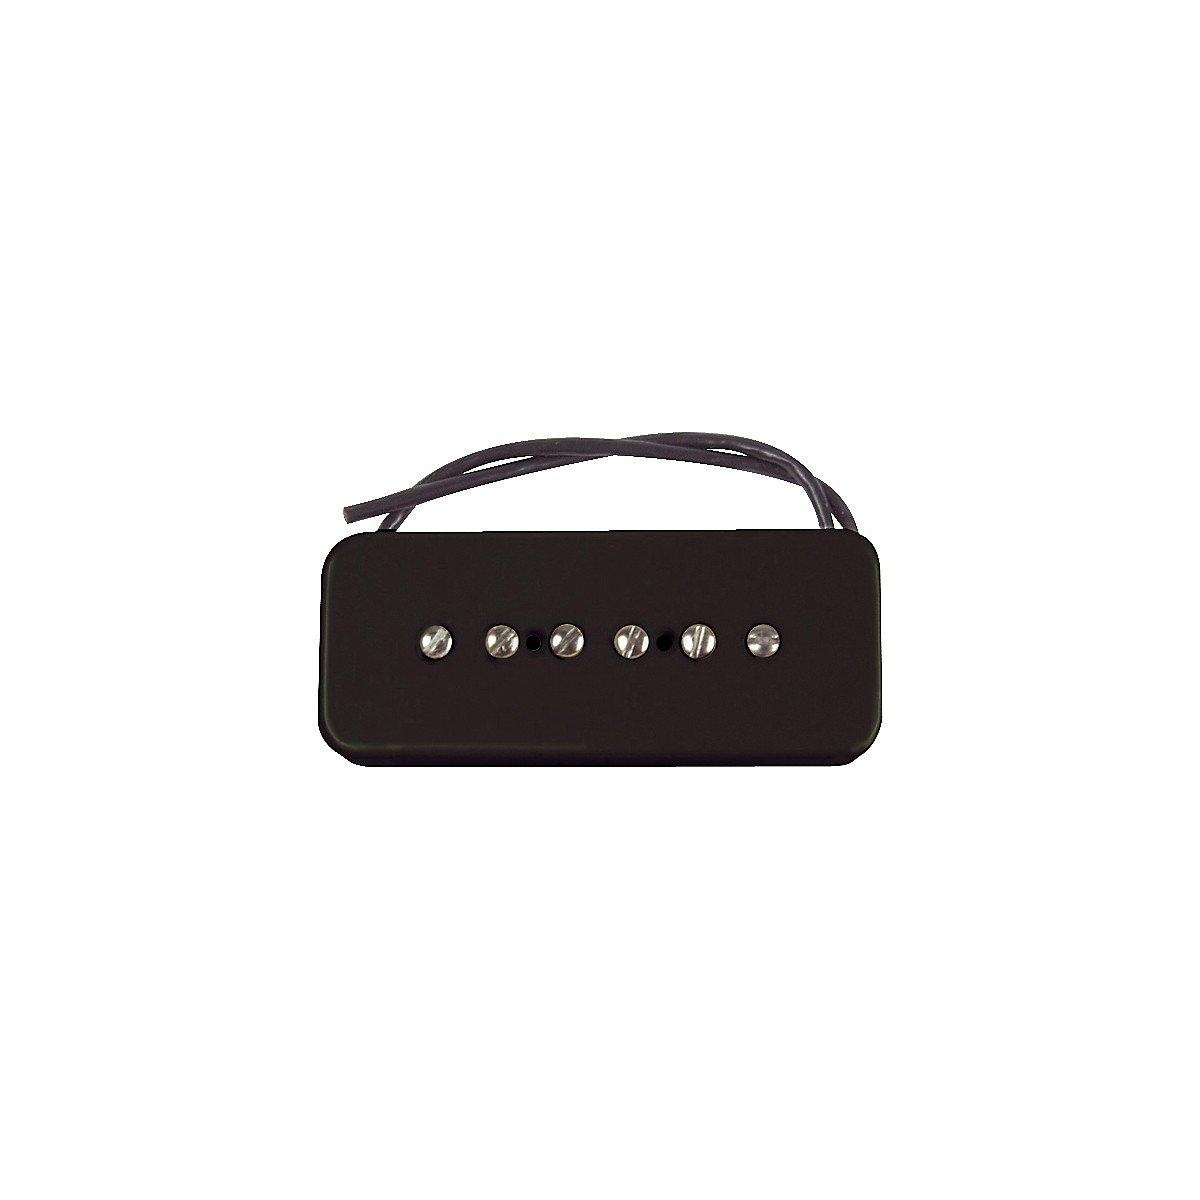 Seymour Duncan SP90-1B Guitar Pickup Black 並行輸入品 B0002F520G